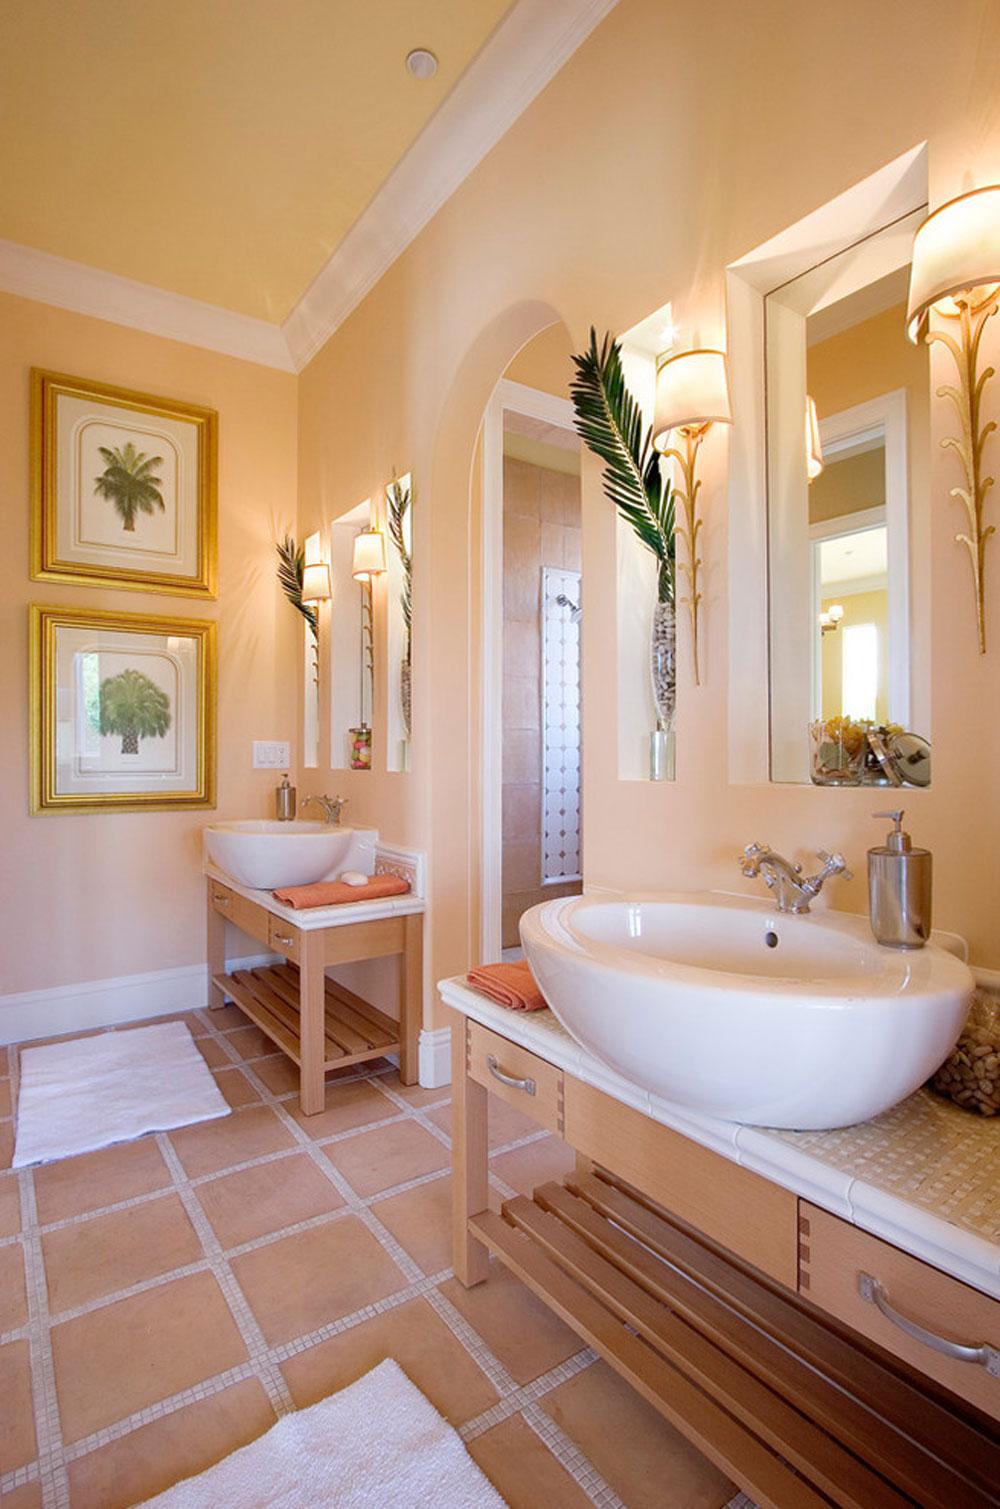 Aquarella-by-Silver-Sea-Homes use the peach color to decorate fantastic interiors